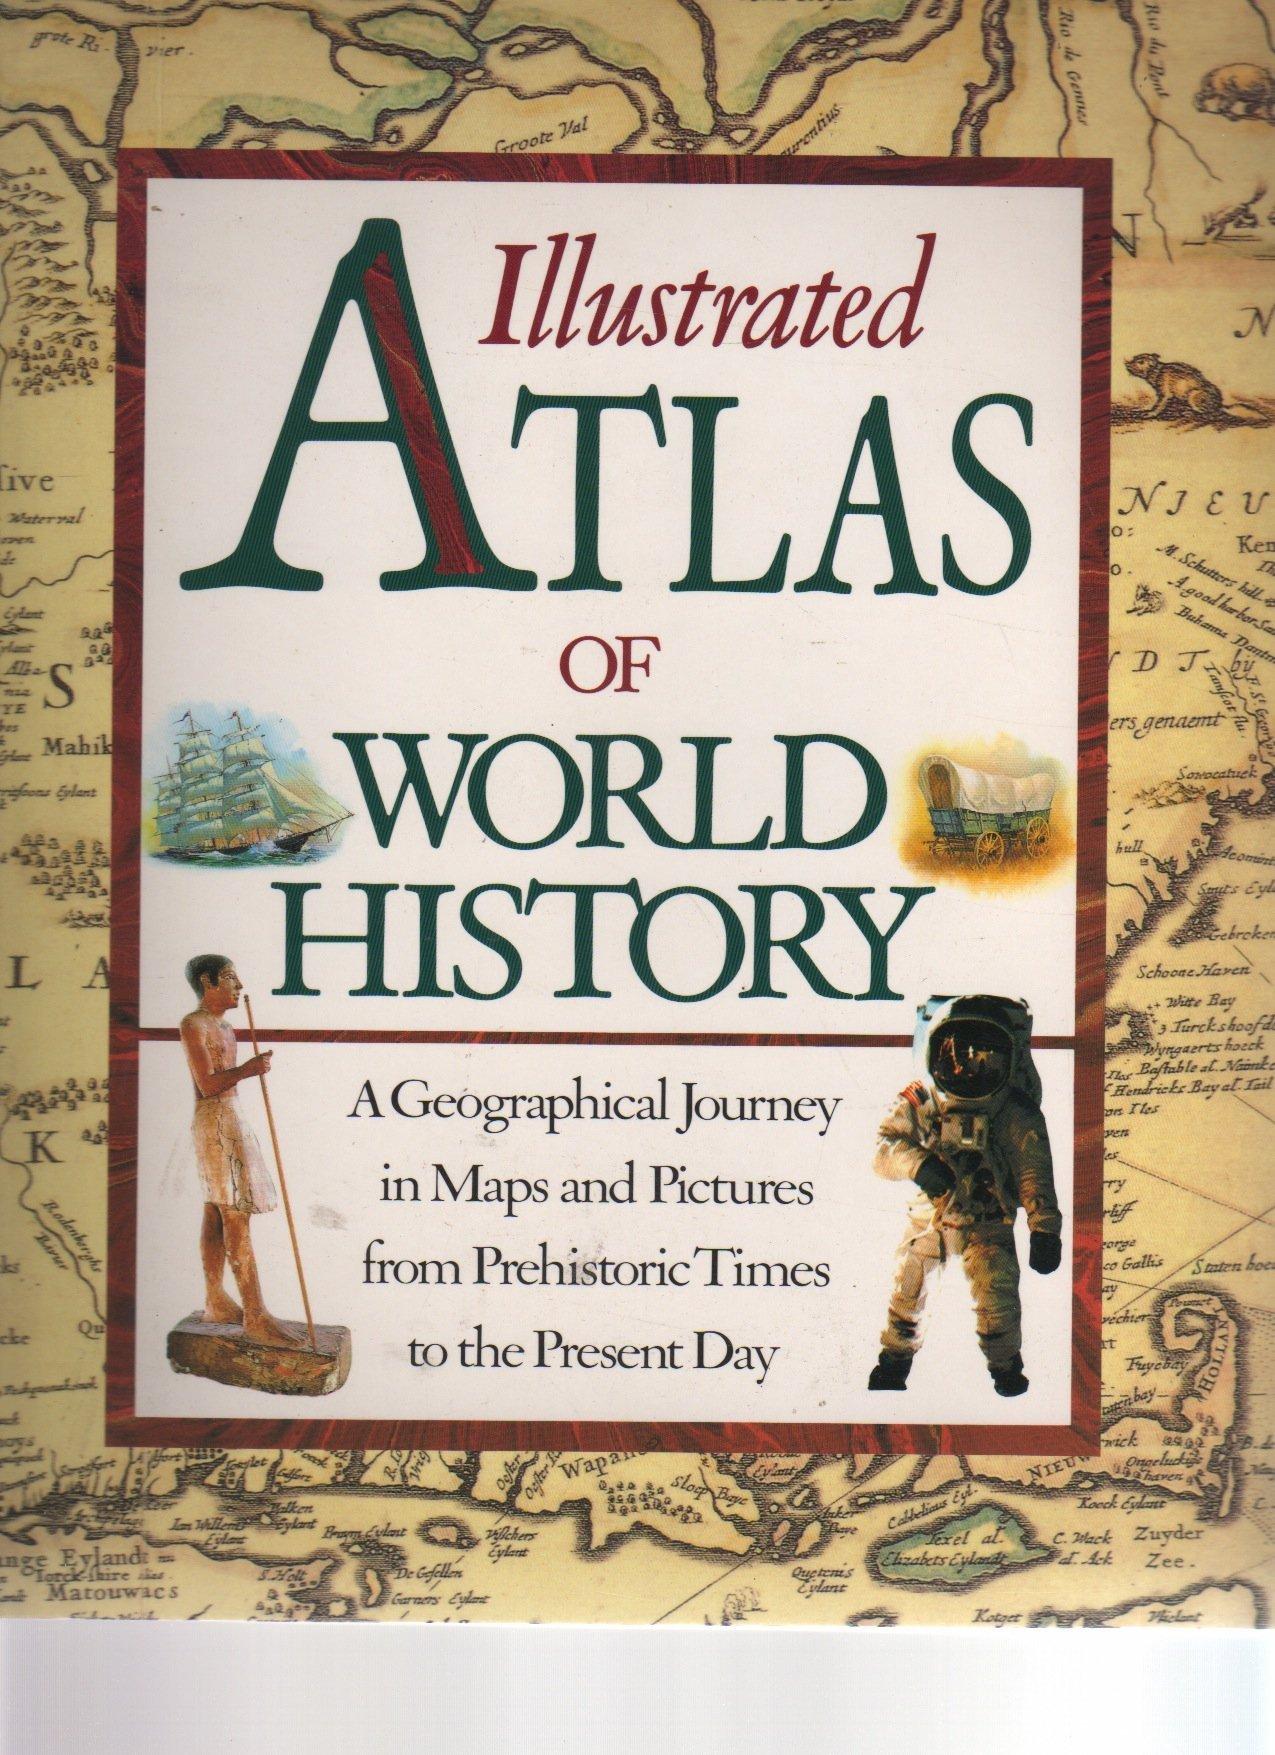 Illustrated Atlas of World History